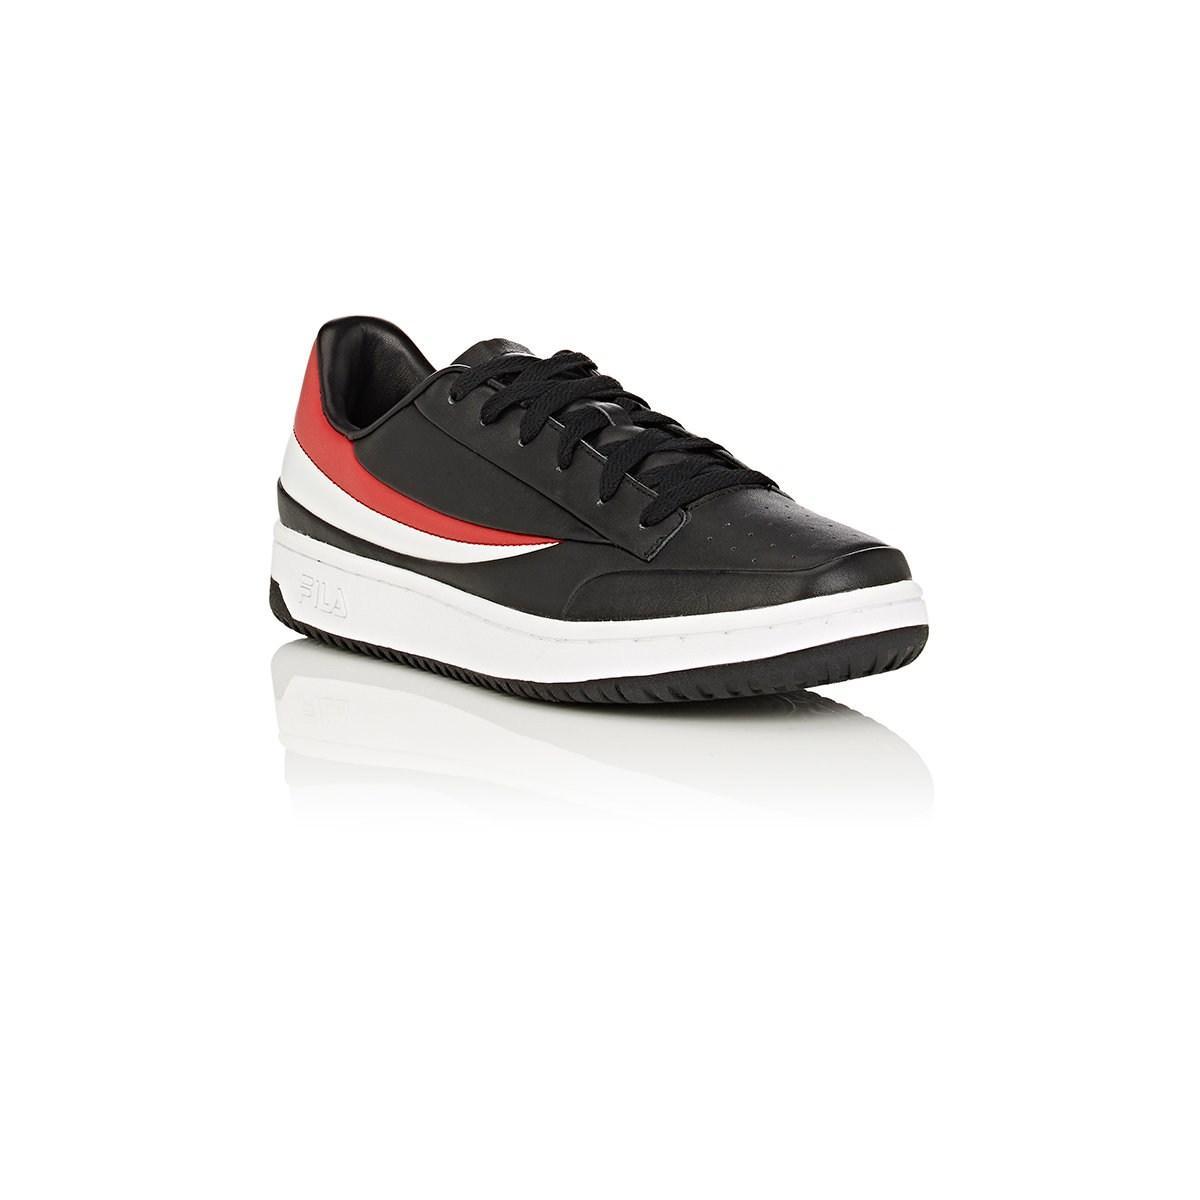 c2971e79d1ae Fila - Black Bny Sole Series  Original Tennis Leather Sneakers for Men -  Lyst. View fullscreen